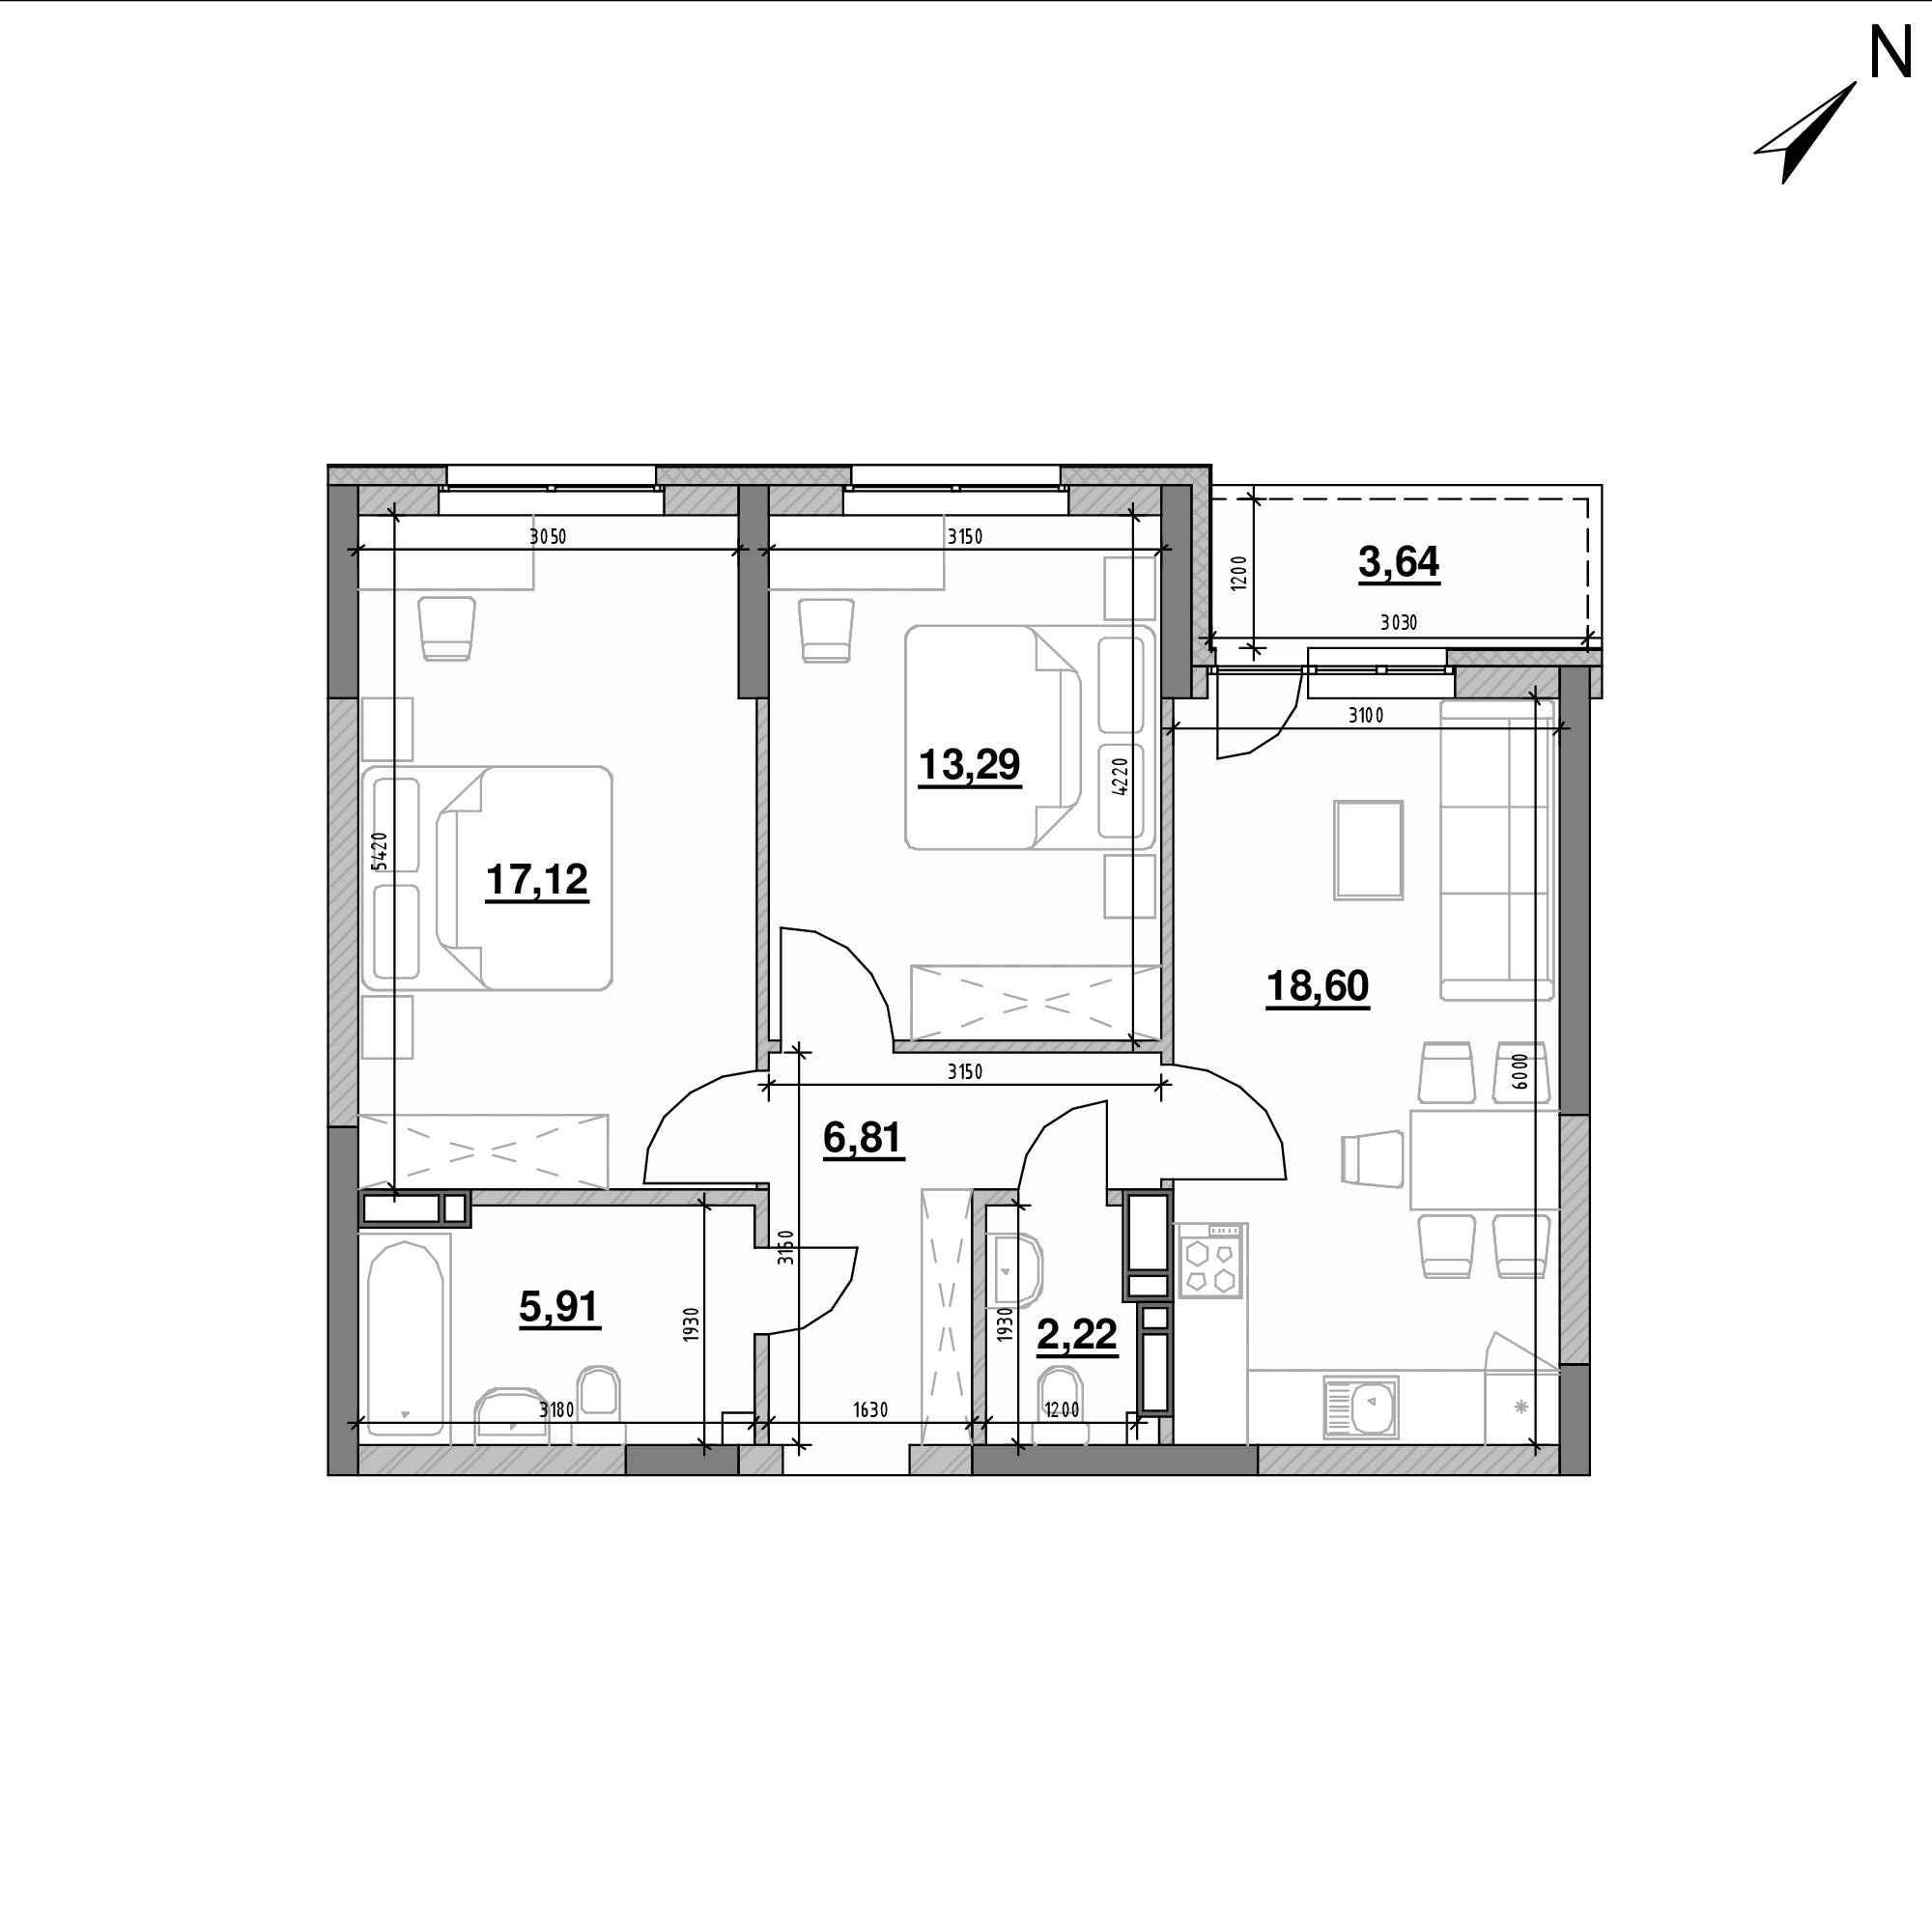 ЖК Оk'Land: планування 2-кімнатної квартири, №332, 67.59 м<sup>2</sup>